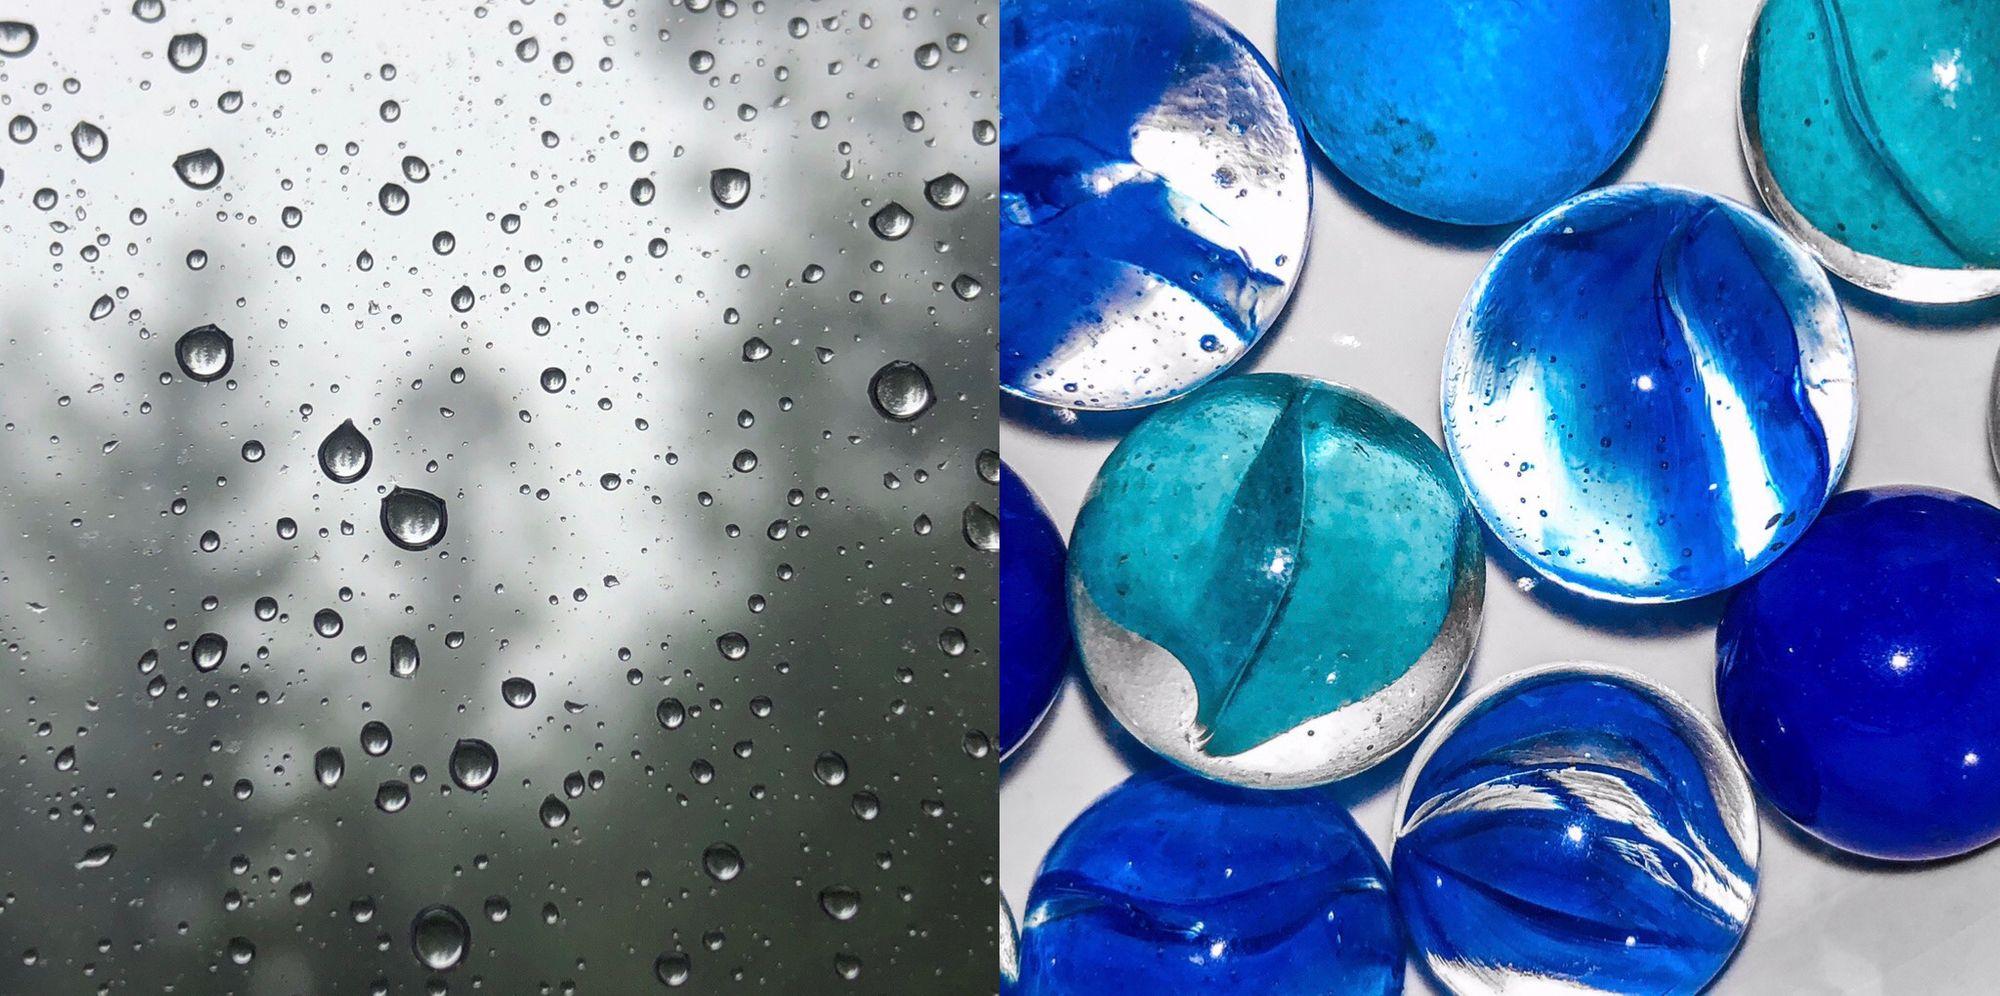 rain & marbles.jpg